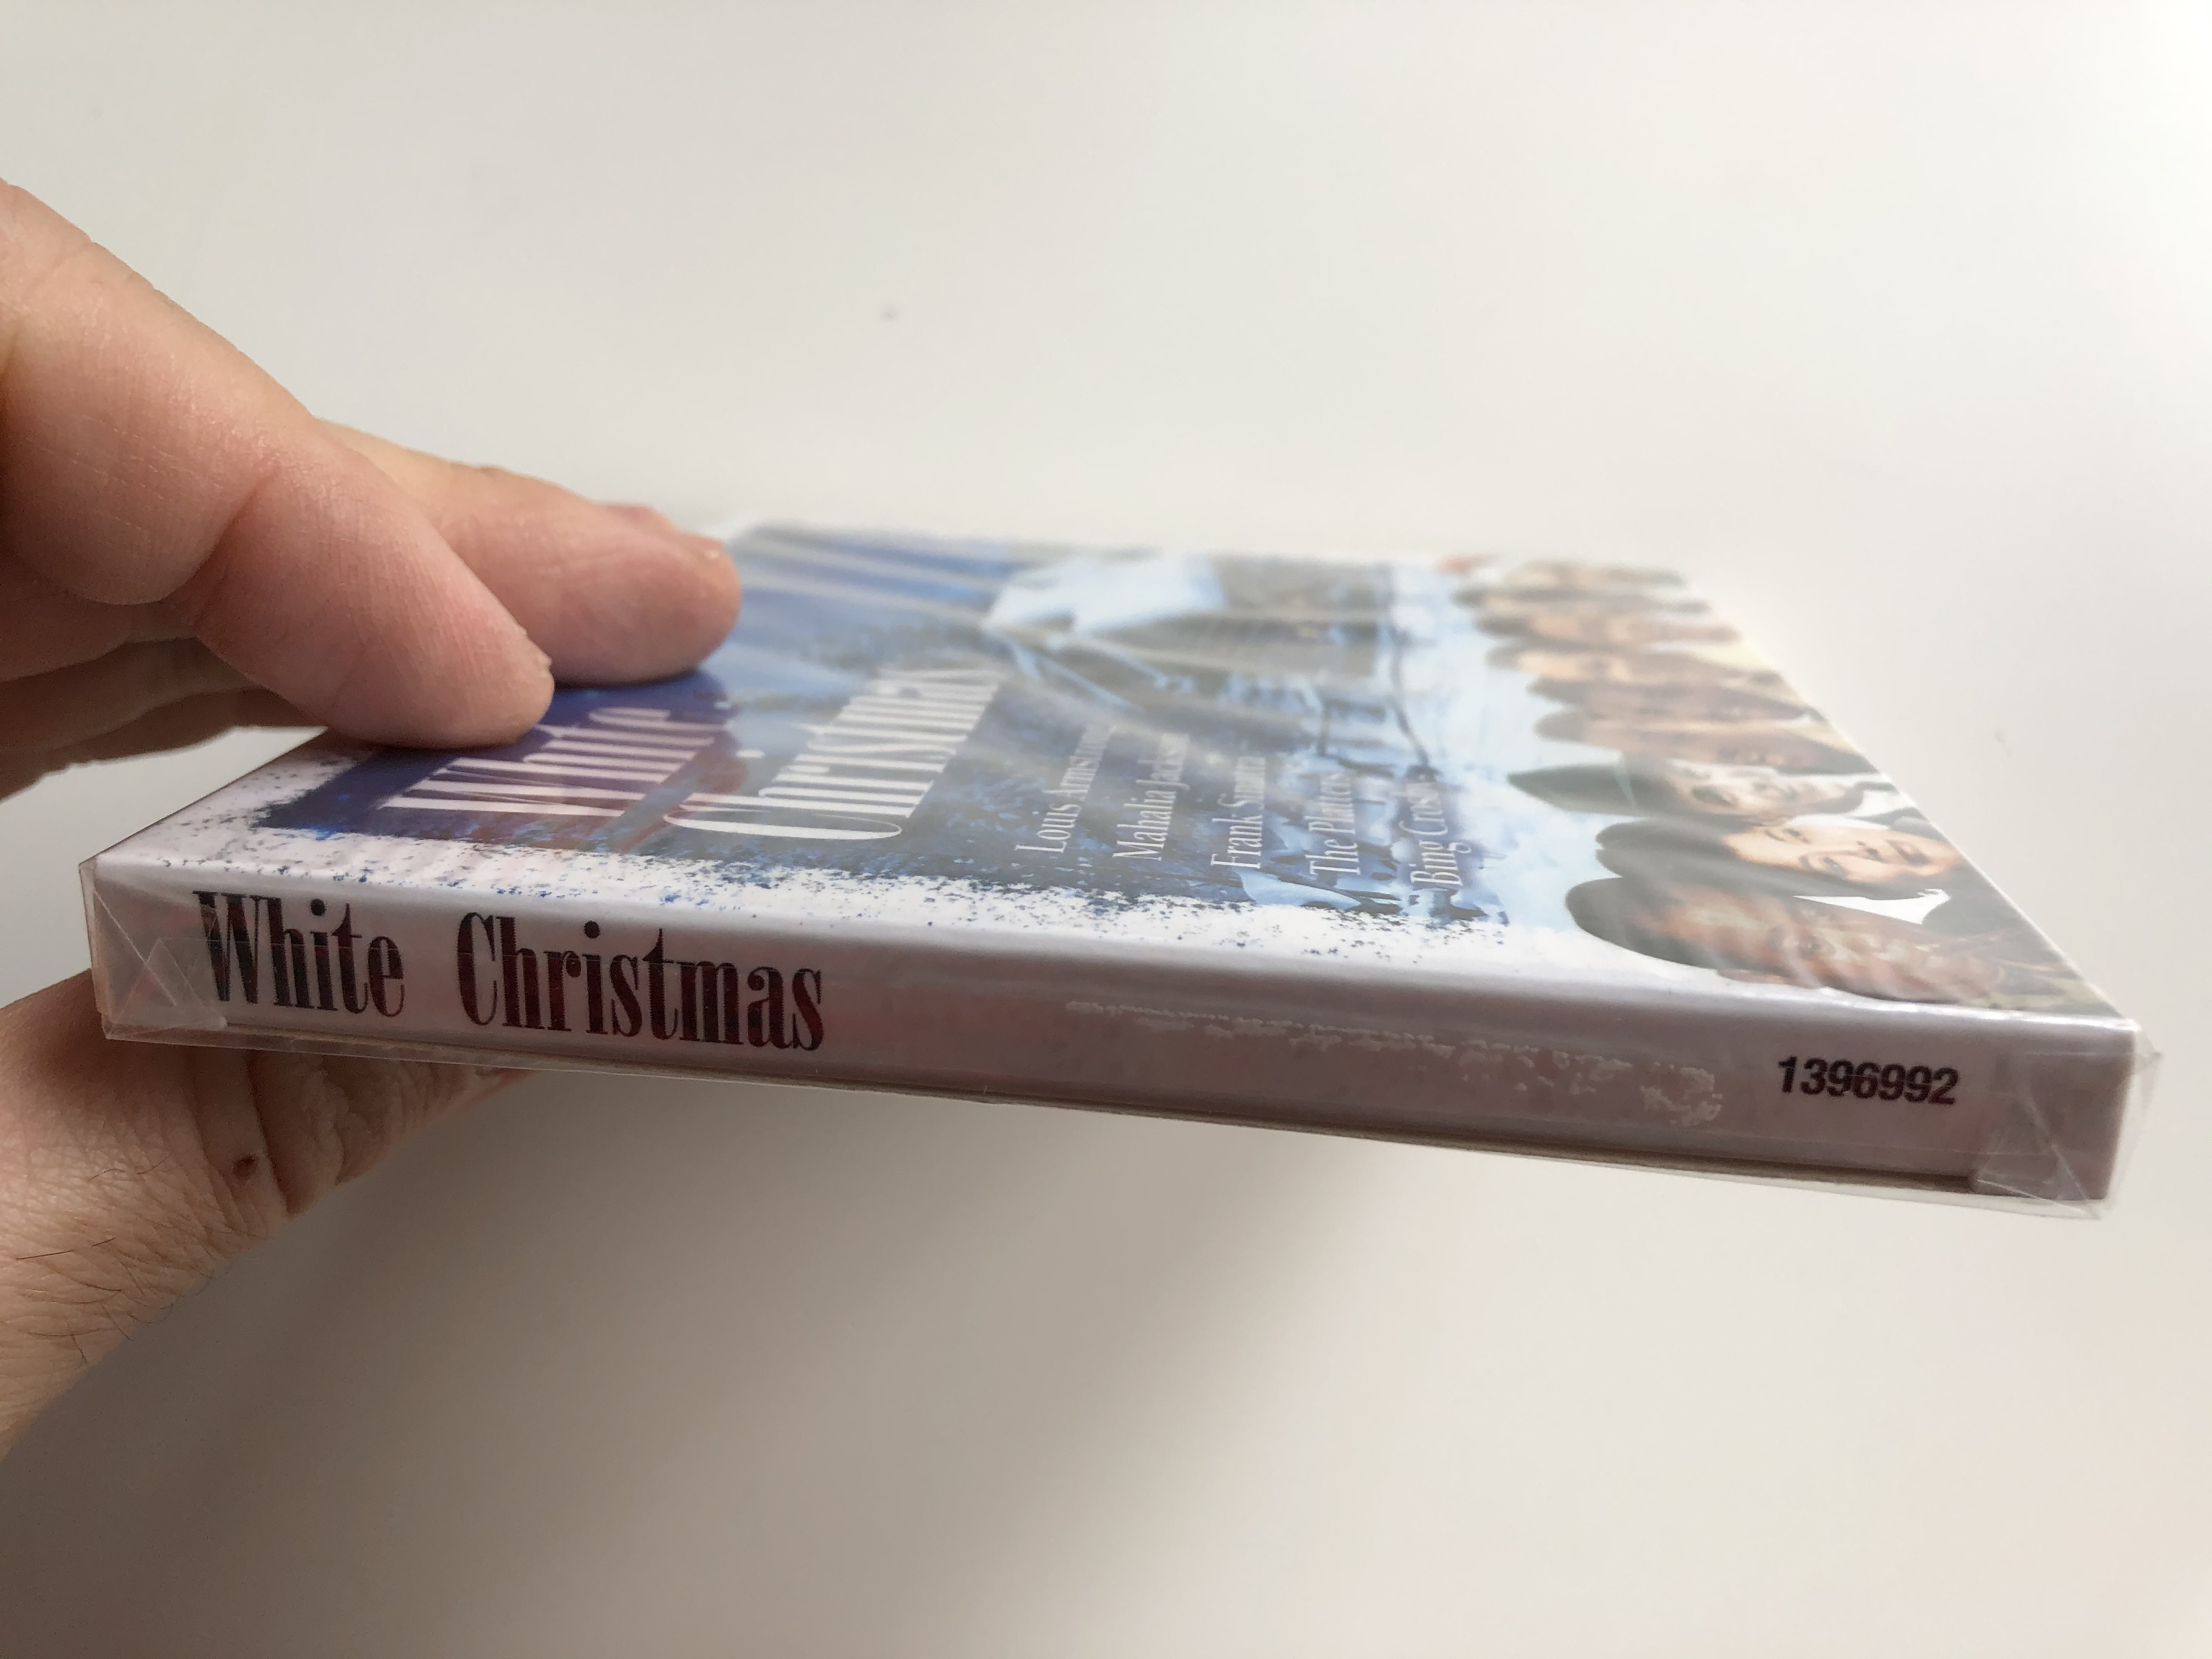 white-christmas-louis-armstrong-mahalia-jackson-frank-sinatra-the-platters-bing-crosby-lmm-audio-cd-2007-1396992-3-.jpg